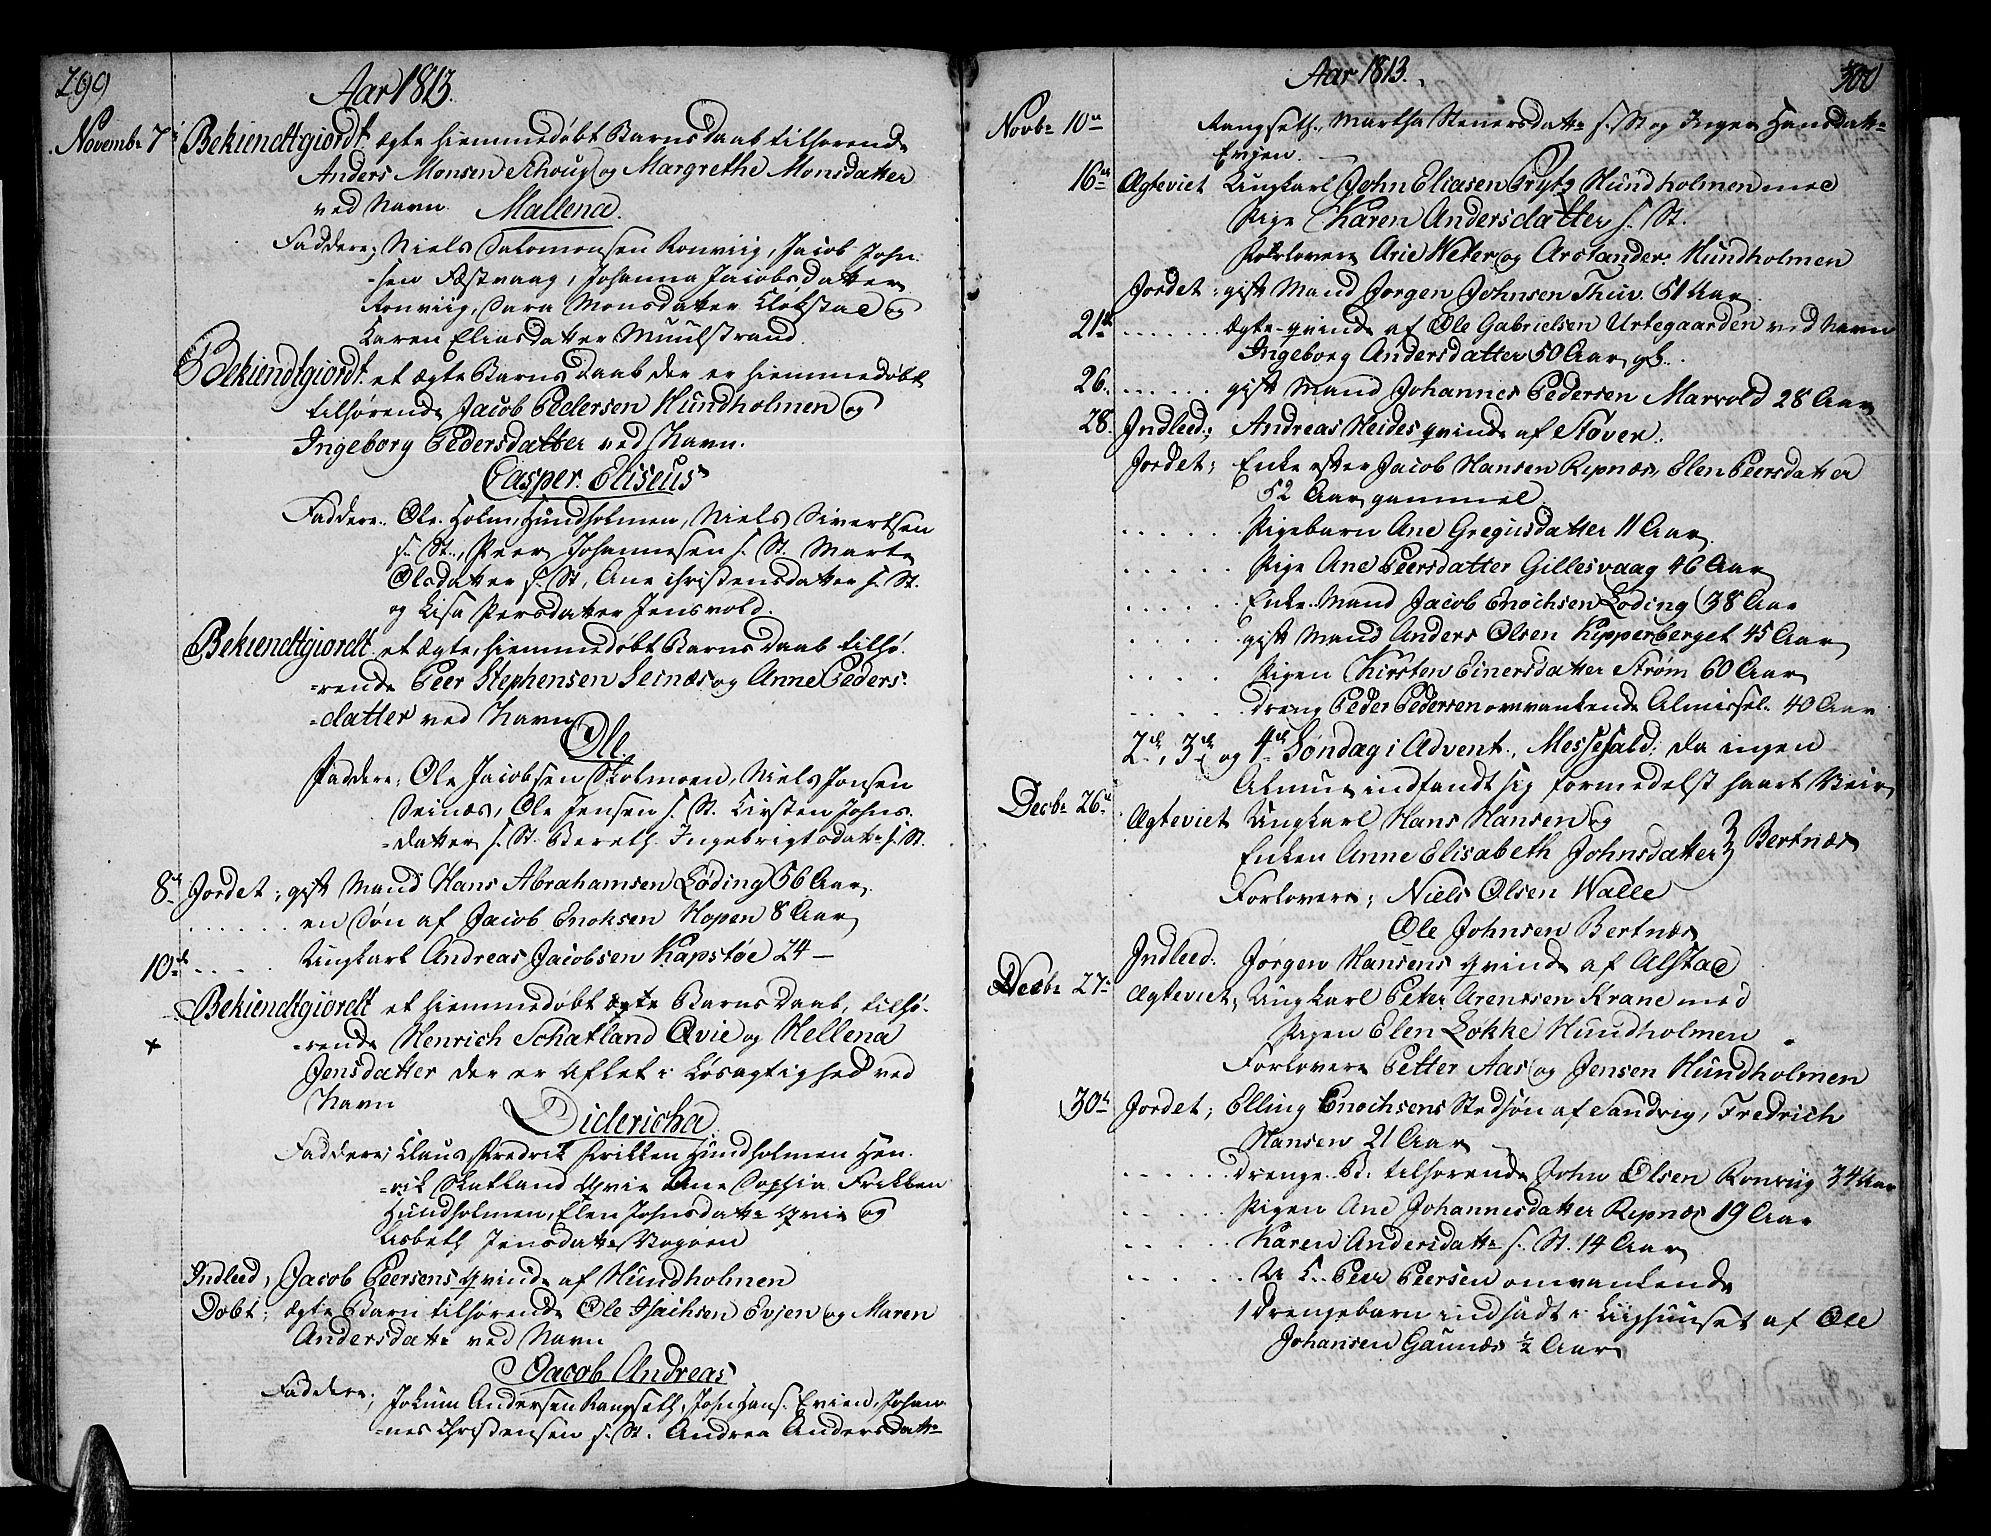 SAT, Ministerialprotokoller, klokkerbøker og fødselsregistre - Nordland, 801/L0004: Ministerialbok nr. 801A04, 1796-1817, s. 299-300